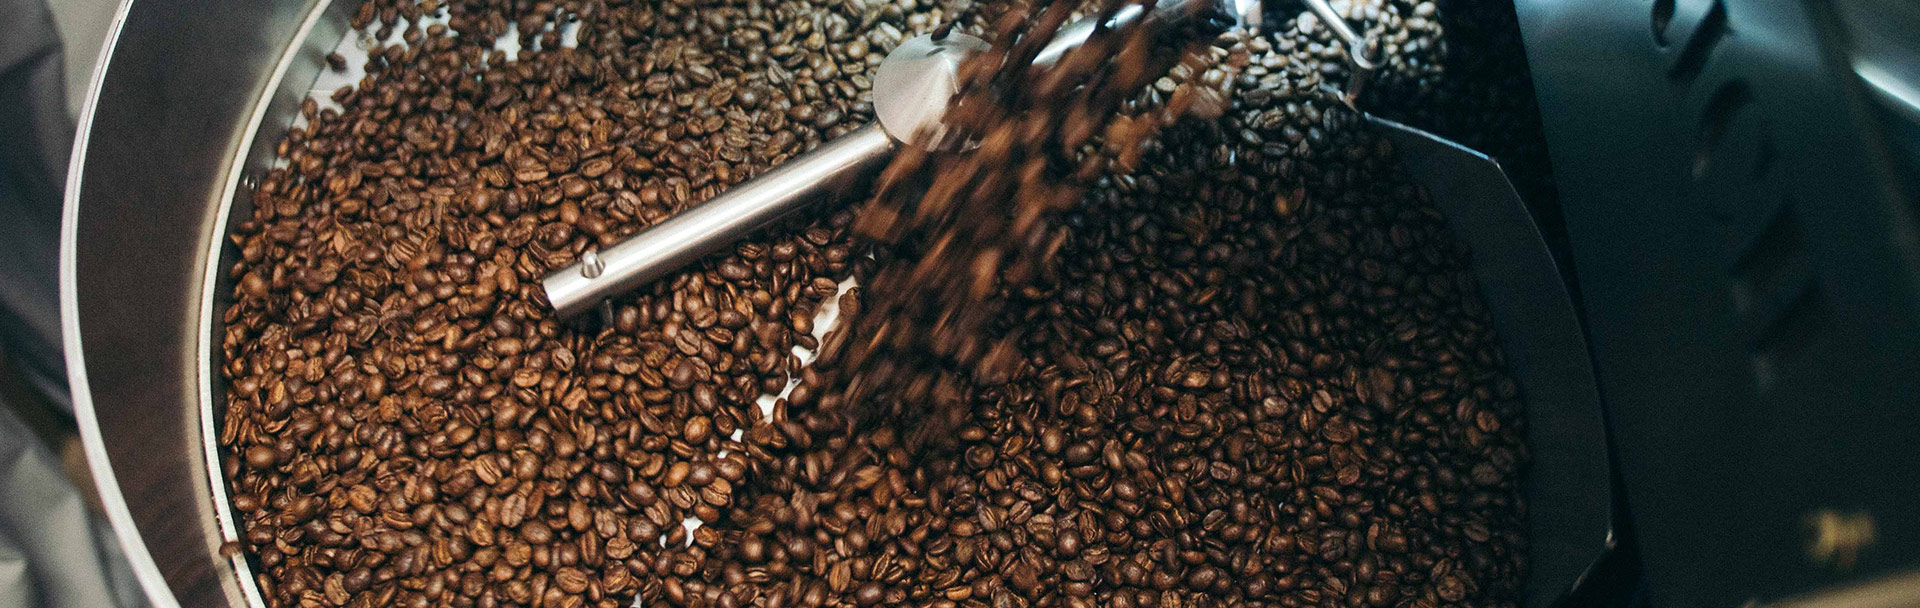 CafCaf Kaffee Blog und Shop